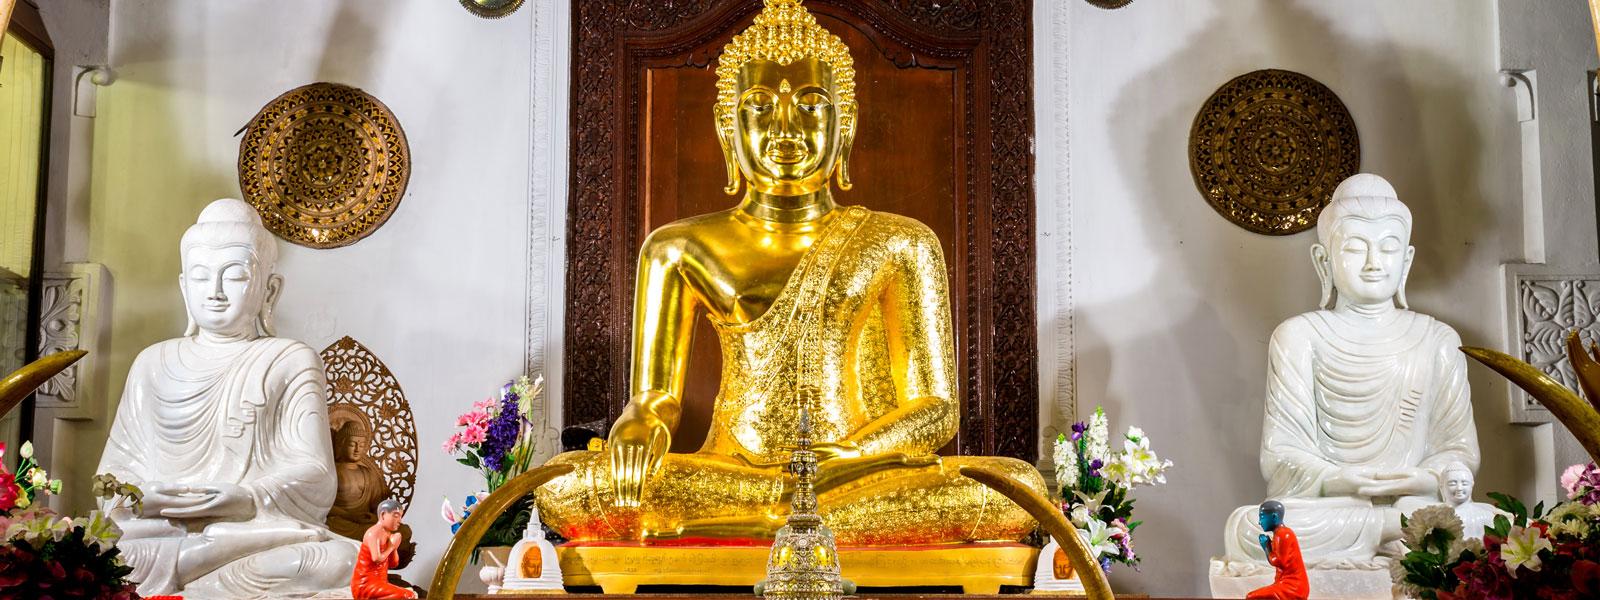 TempleoftheTooth_Buddha_110245562_Fotolia